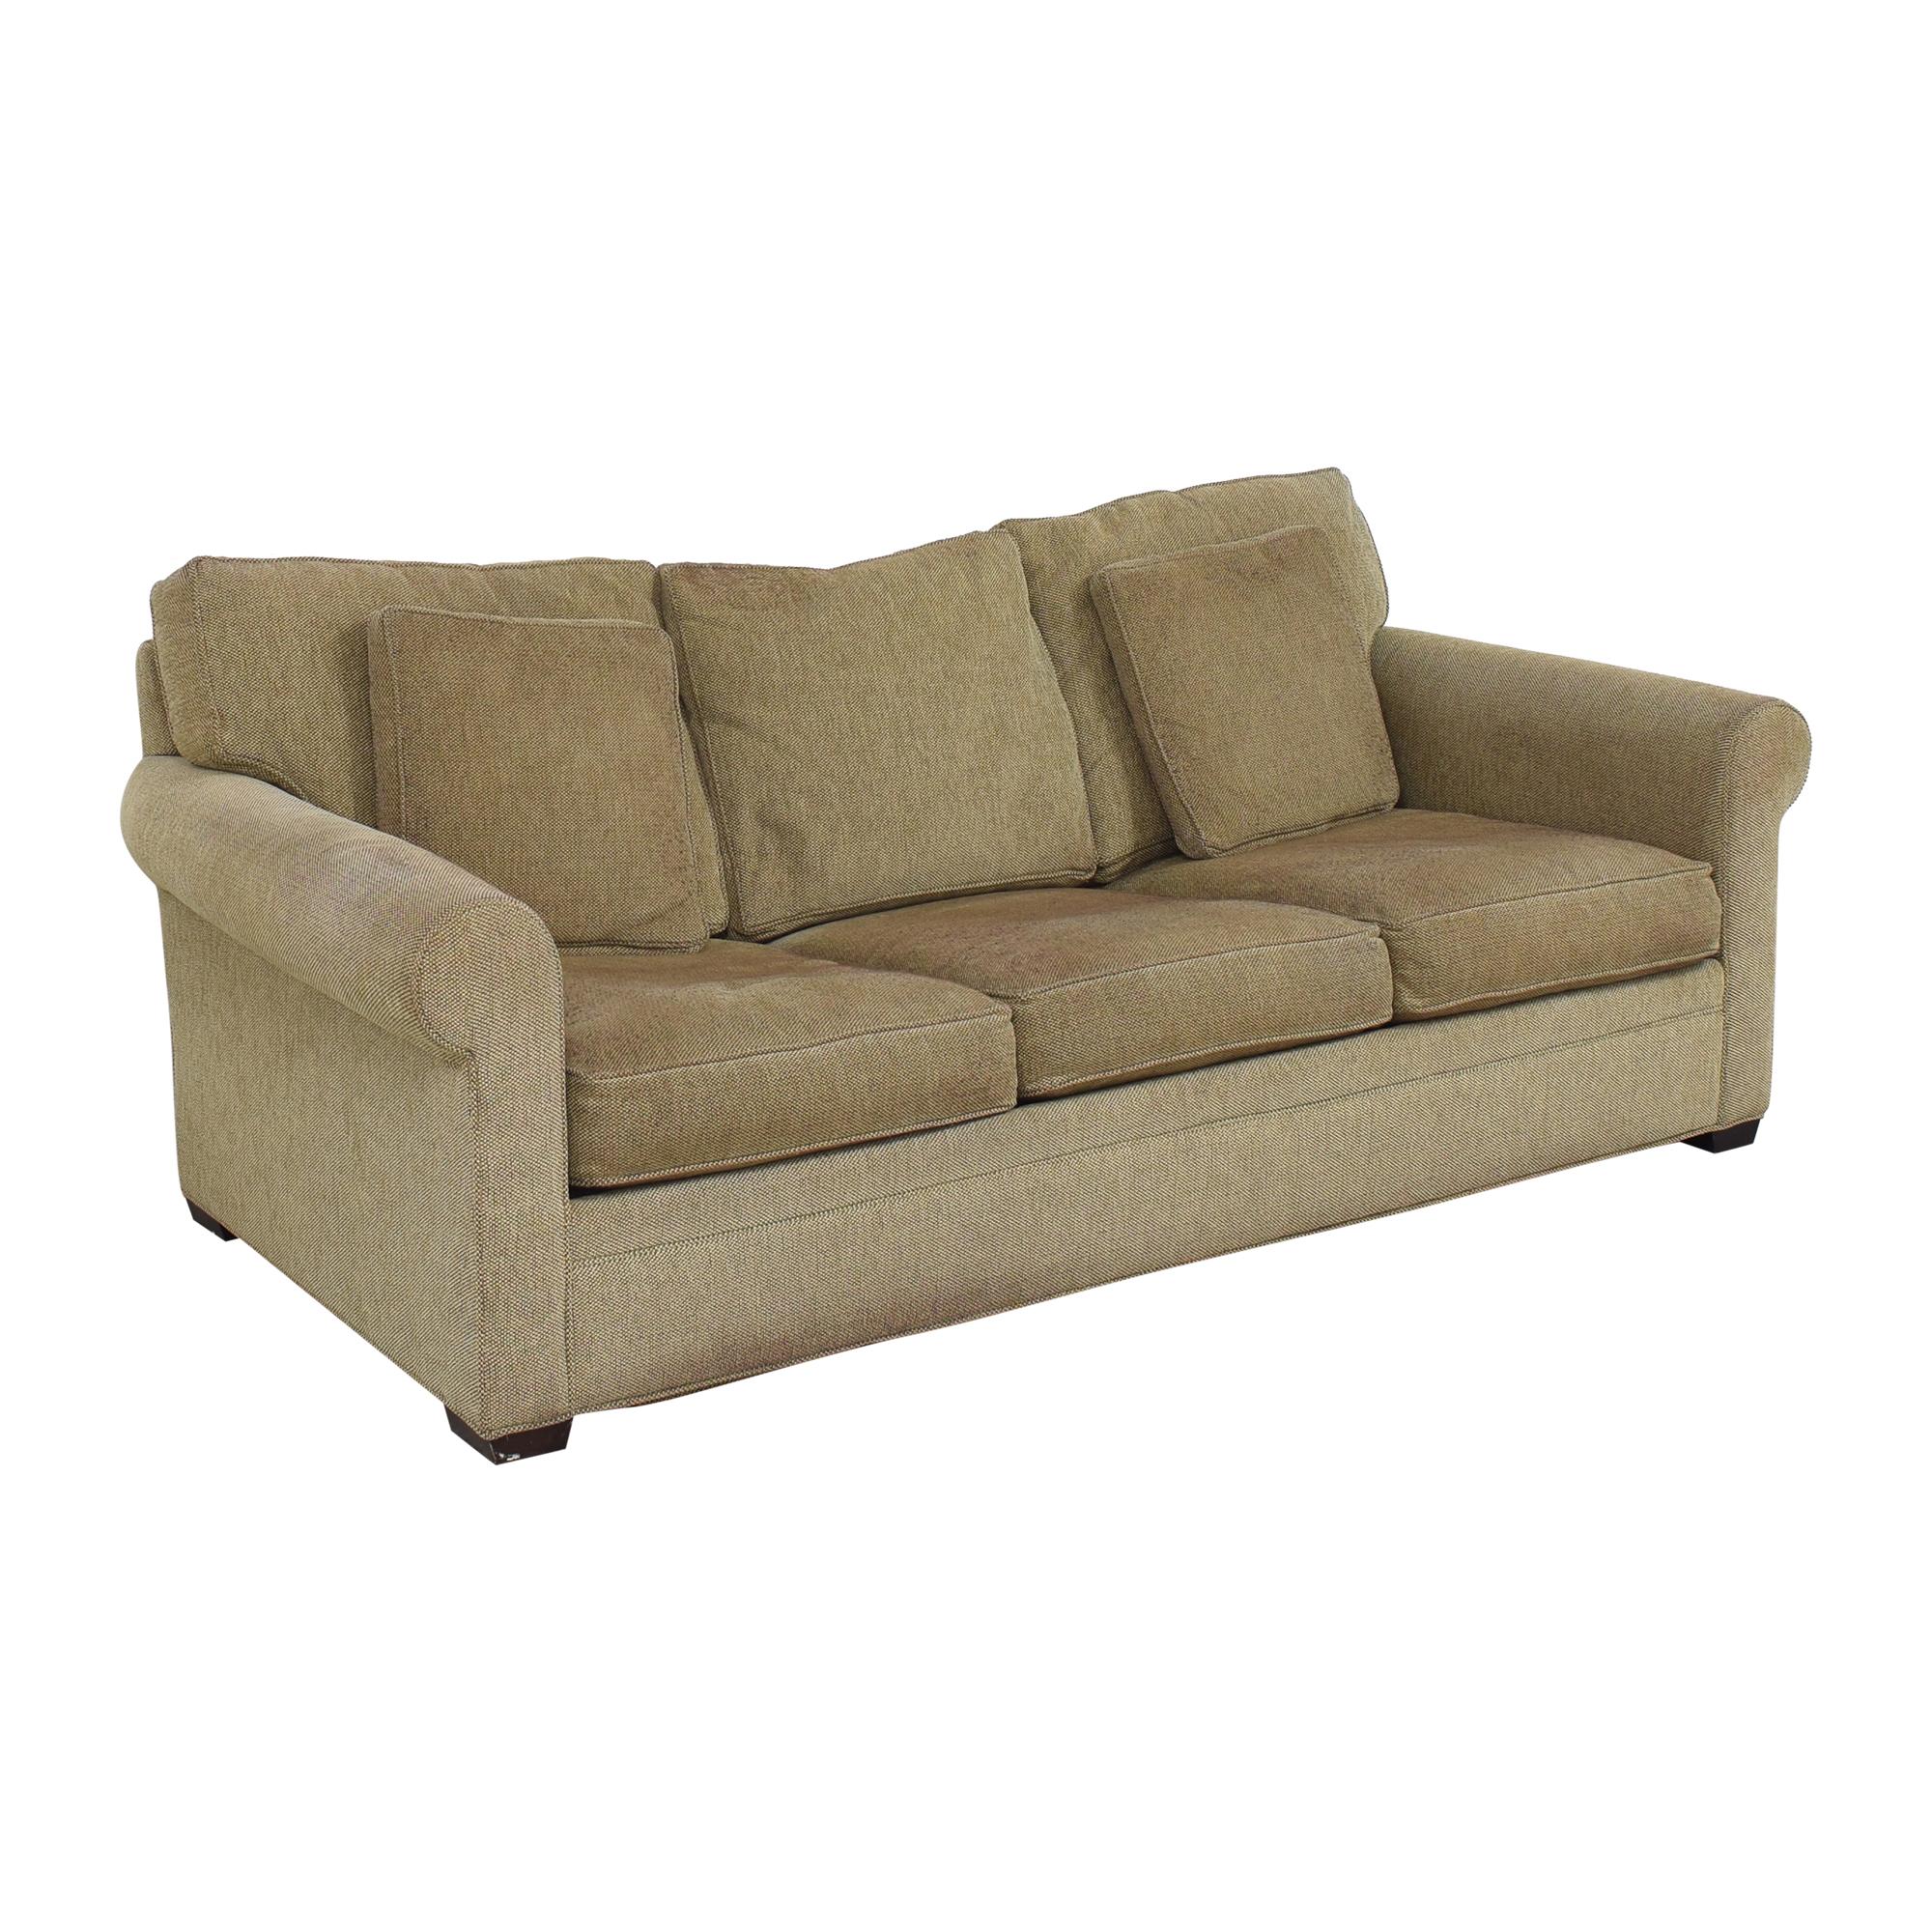 Crate & Barrel Crate & Barrel Three Cushion Sleeper Sofa ma